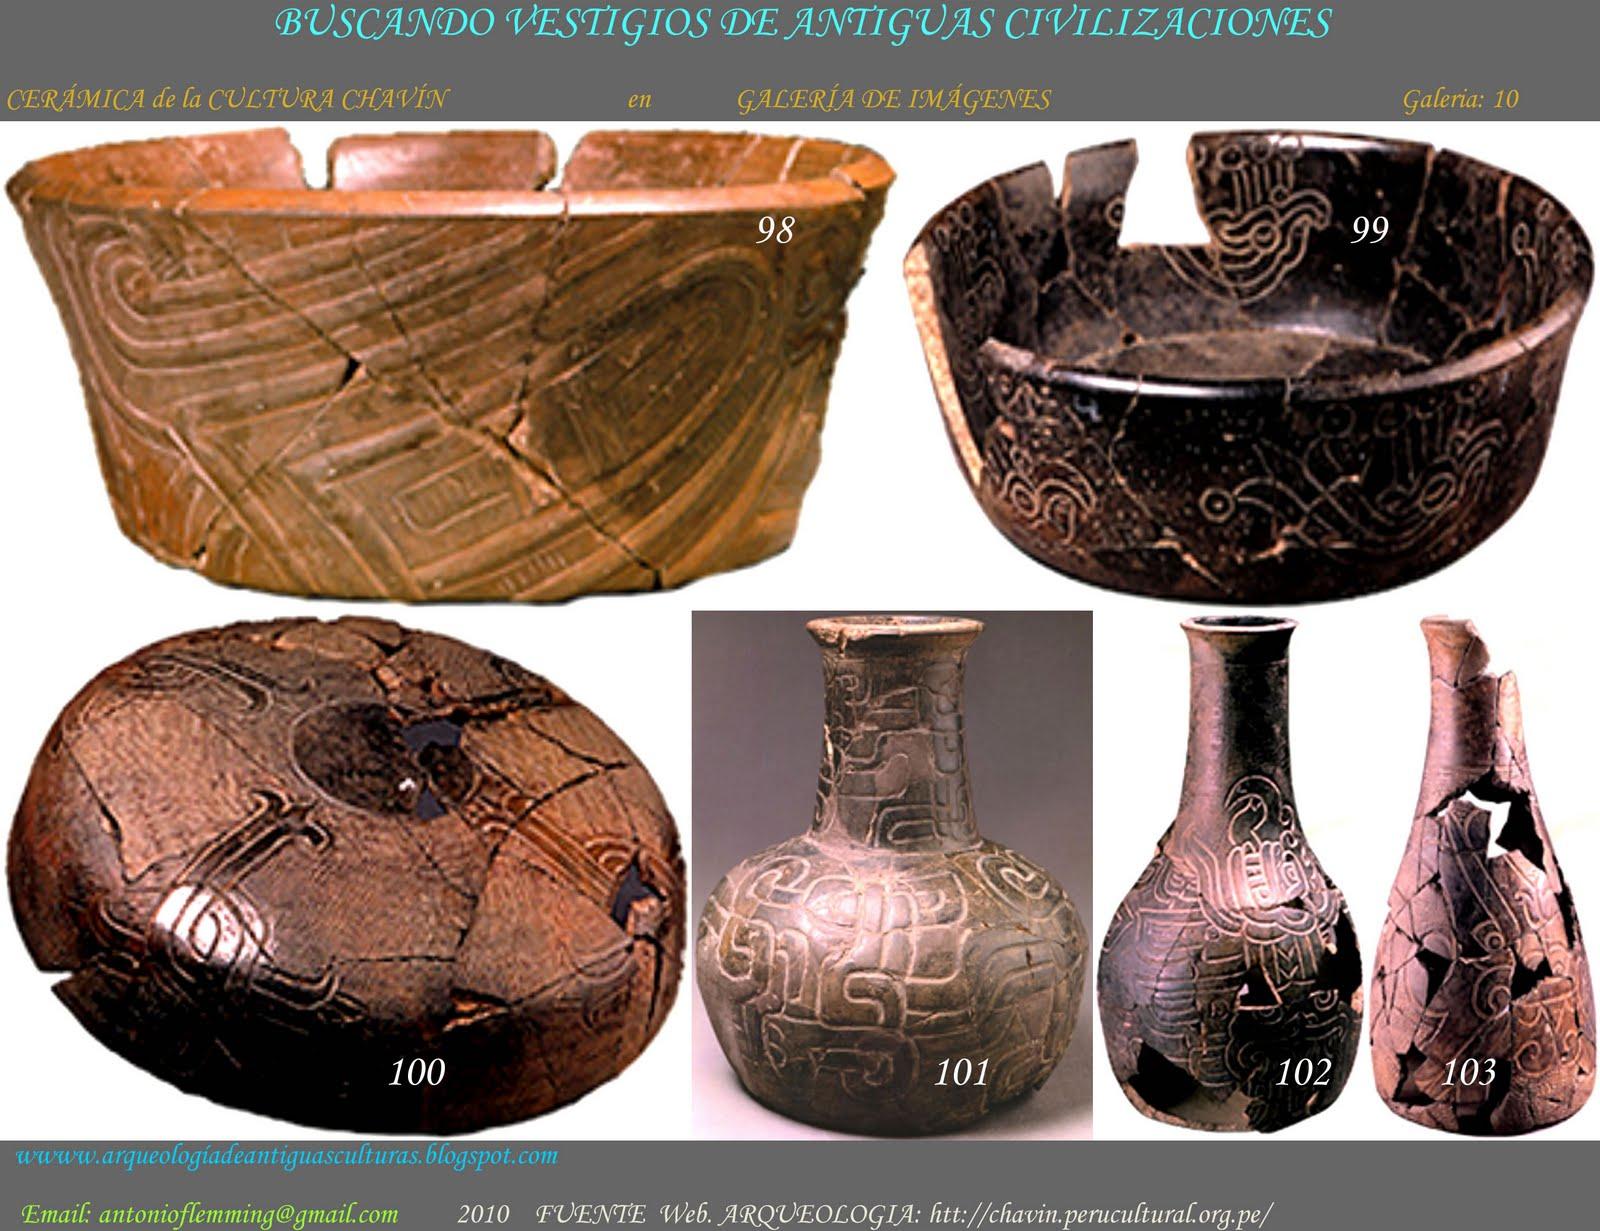 Quinquela cer micas antiguas del per fotos grandes - Fotos de ceramica ...